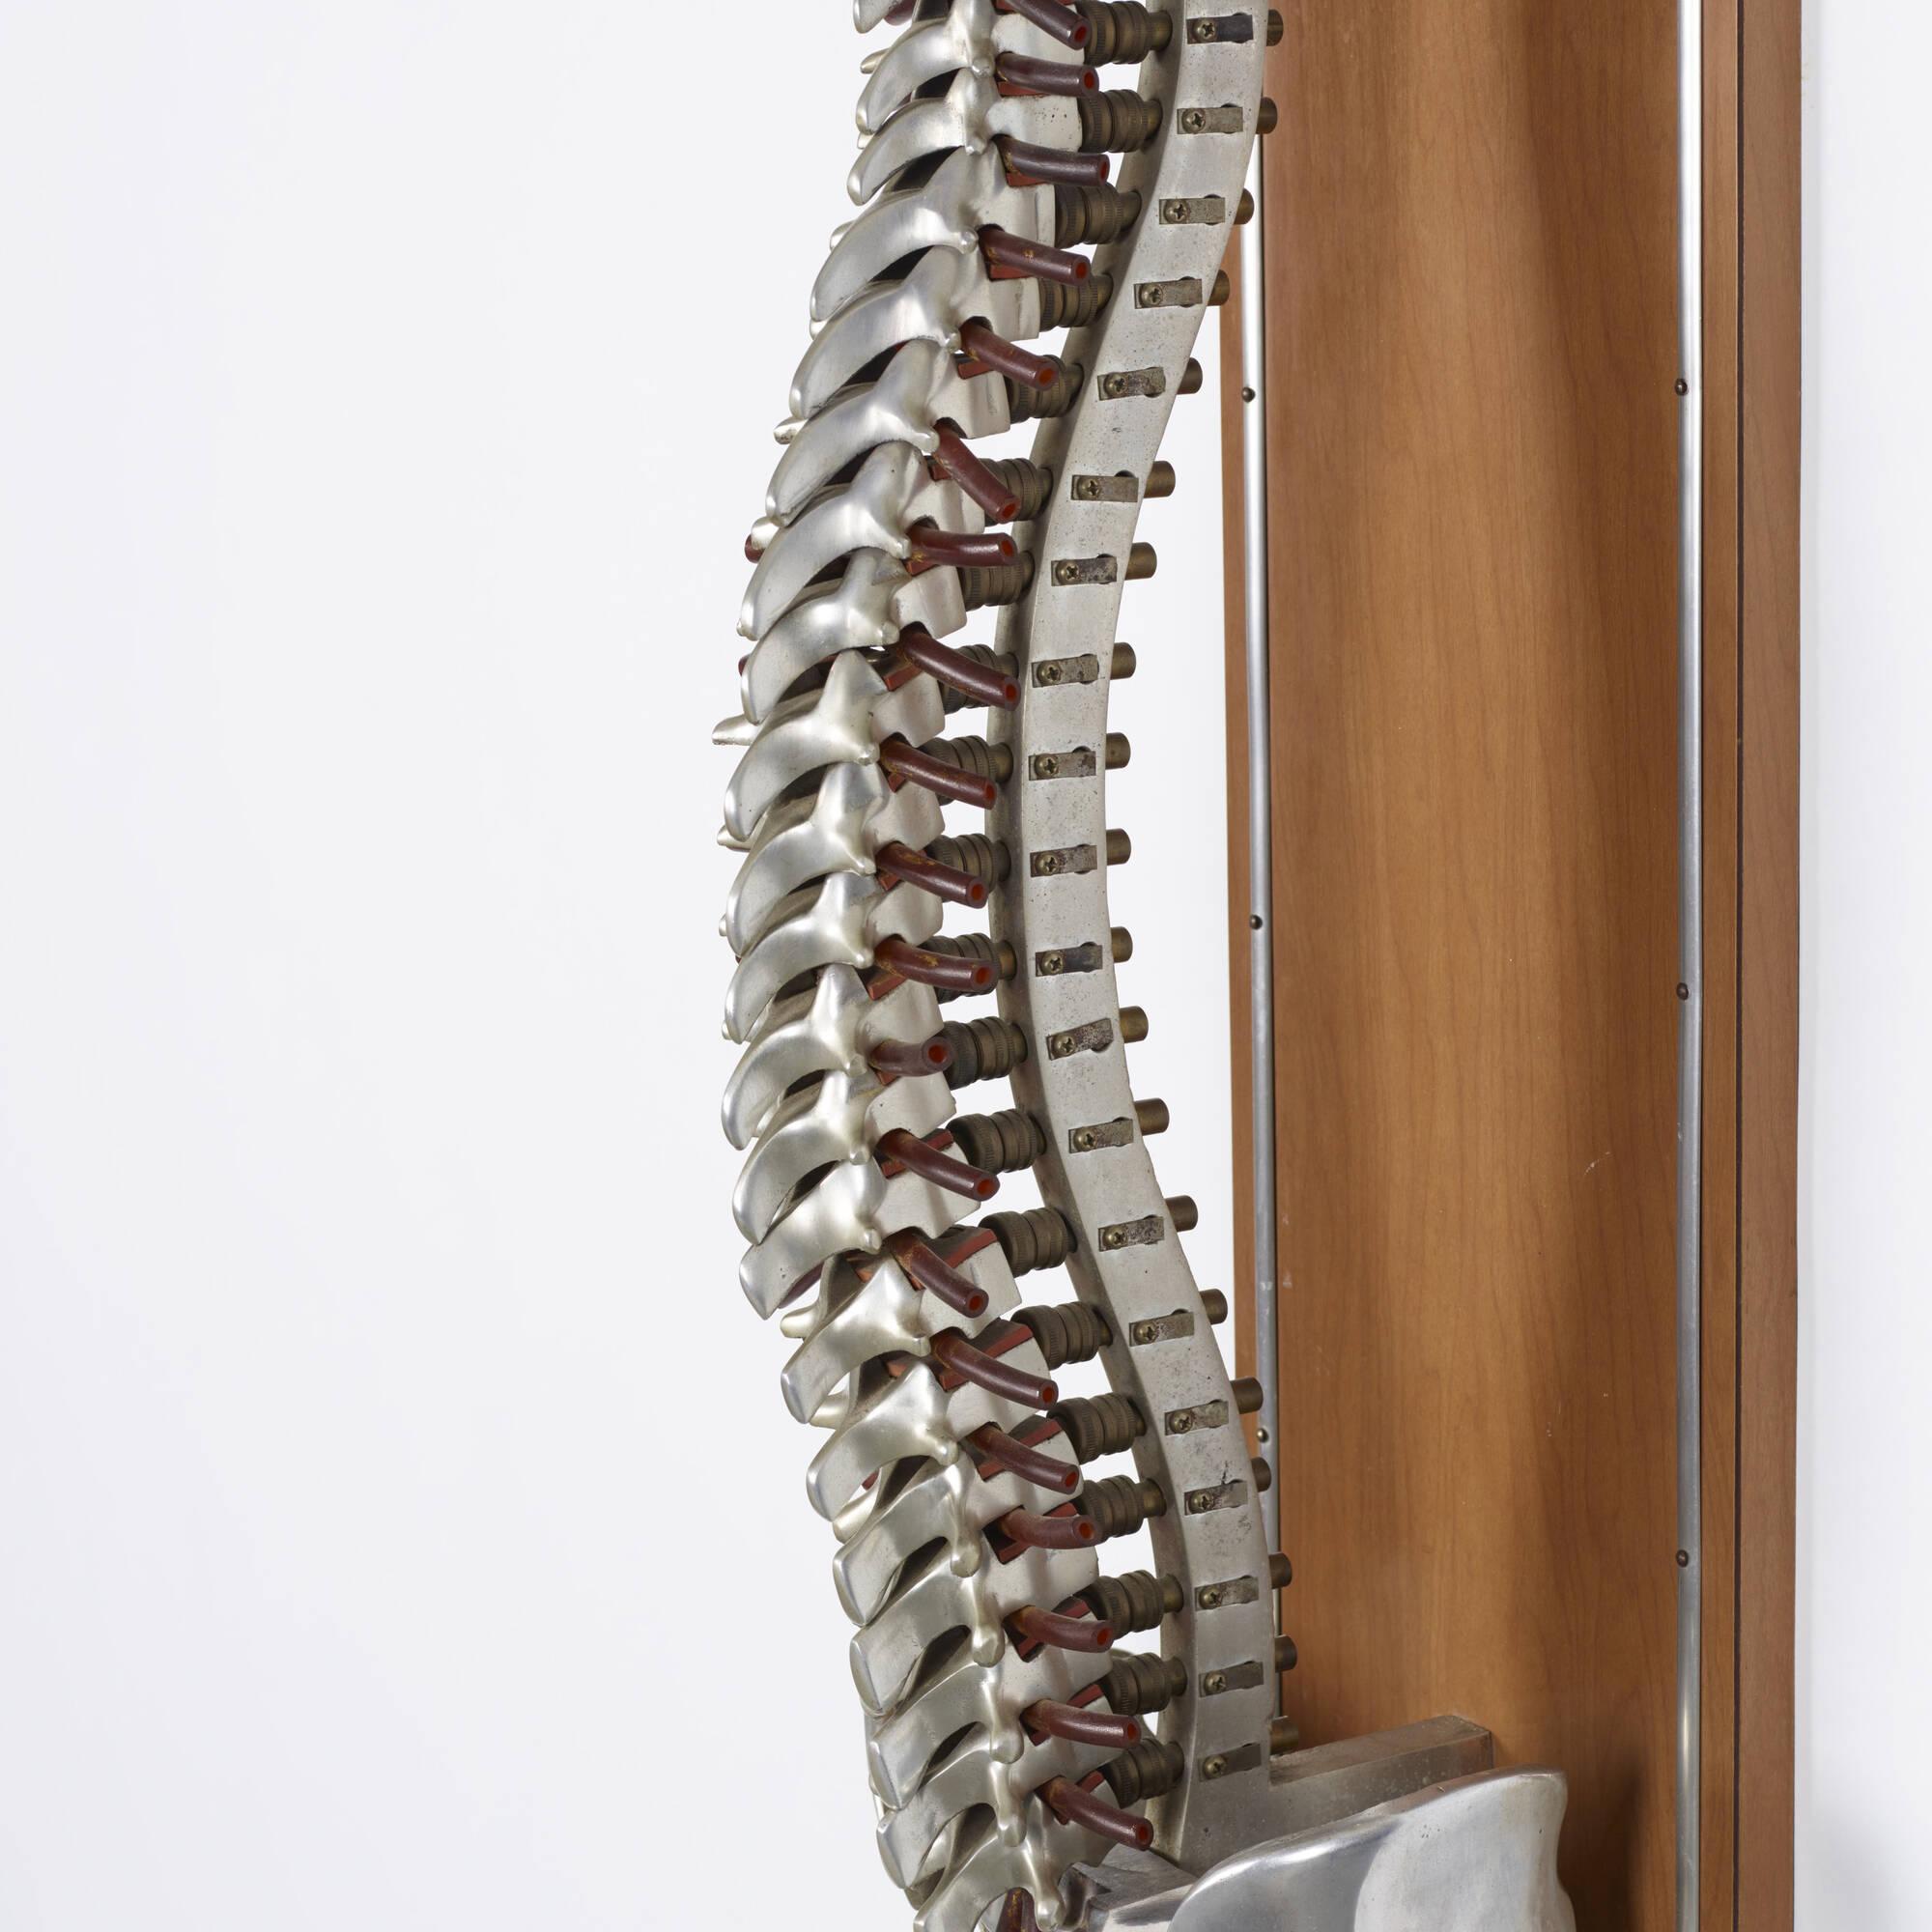 146: Dr. Thurman Fleet / Fleet's Spinal Demonstrator, the Classic Model (2 of 2)